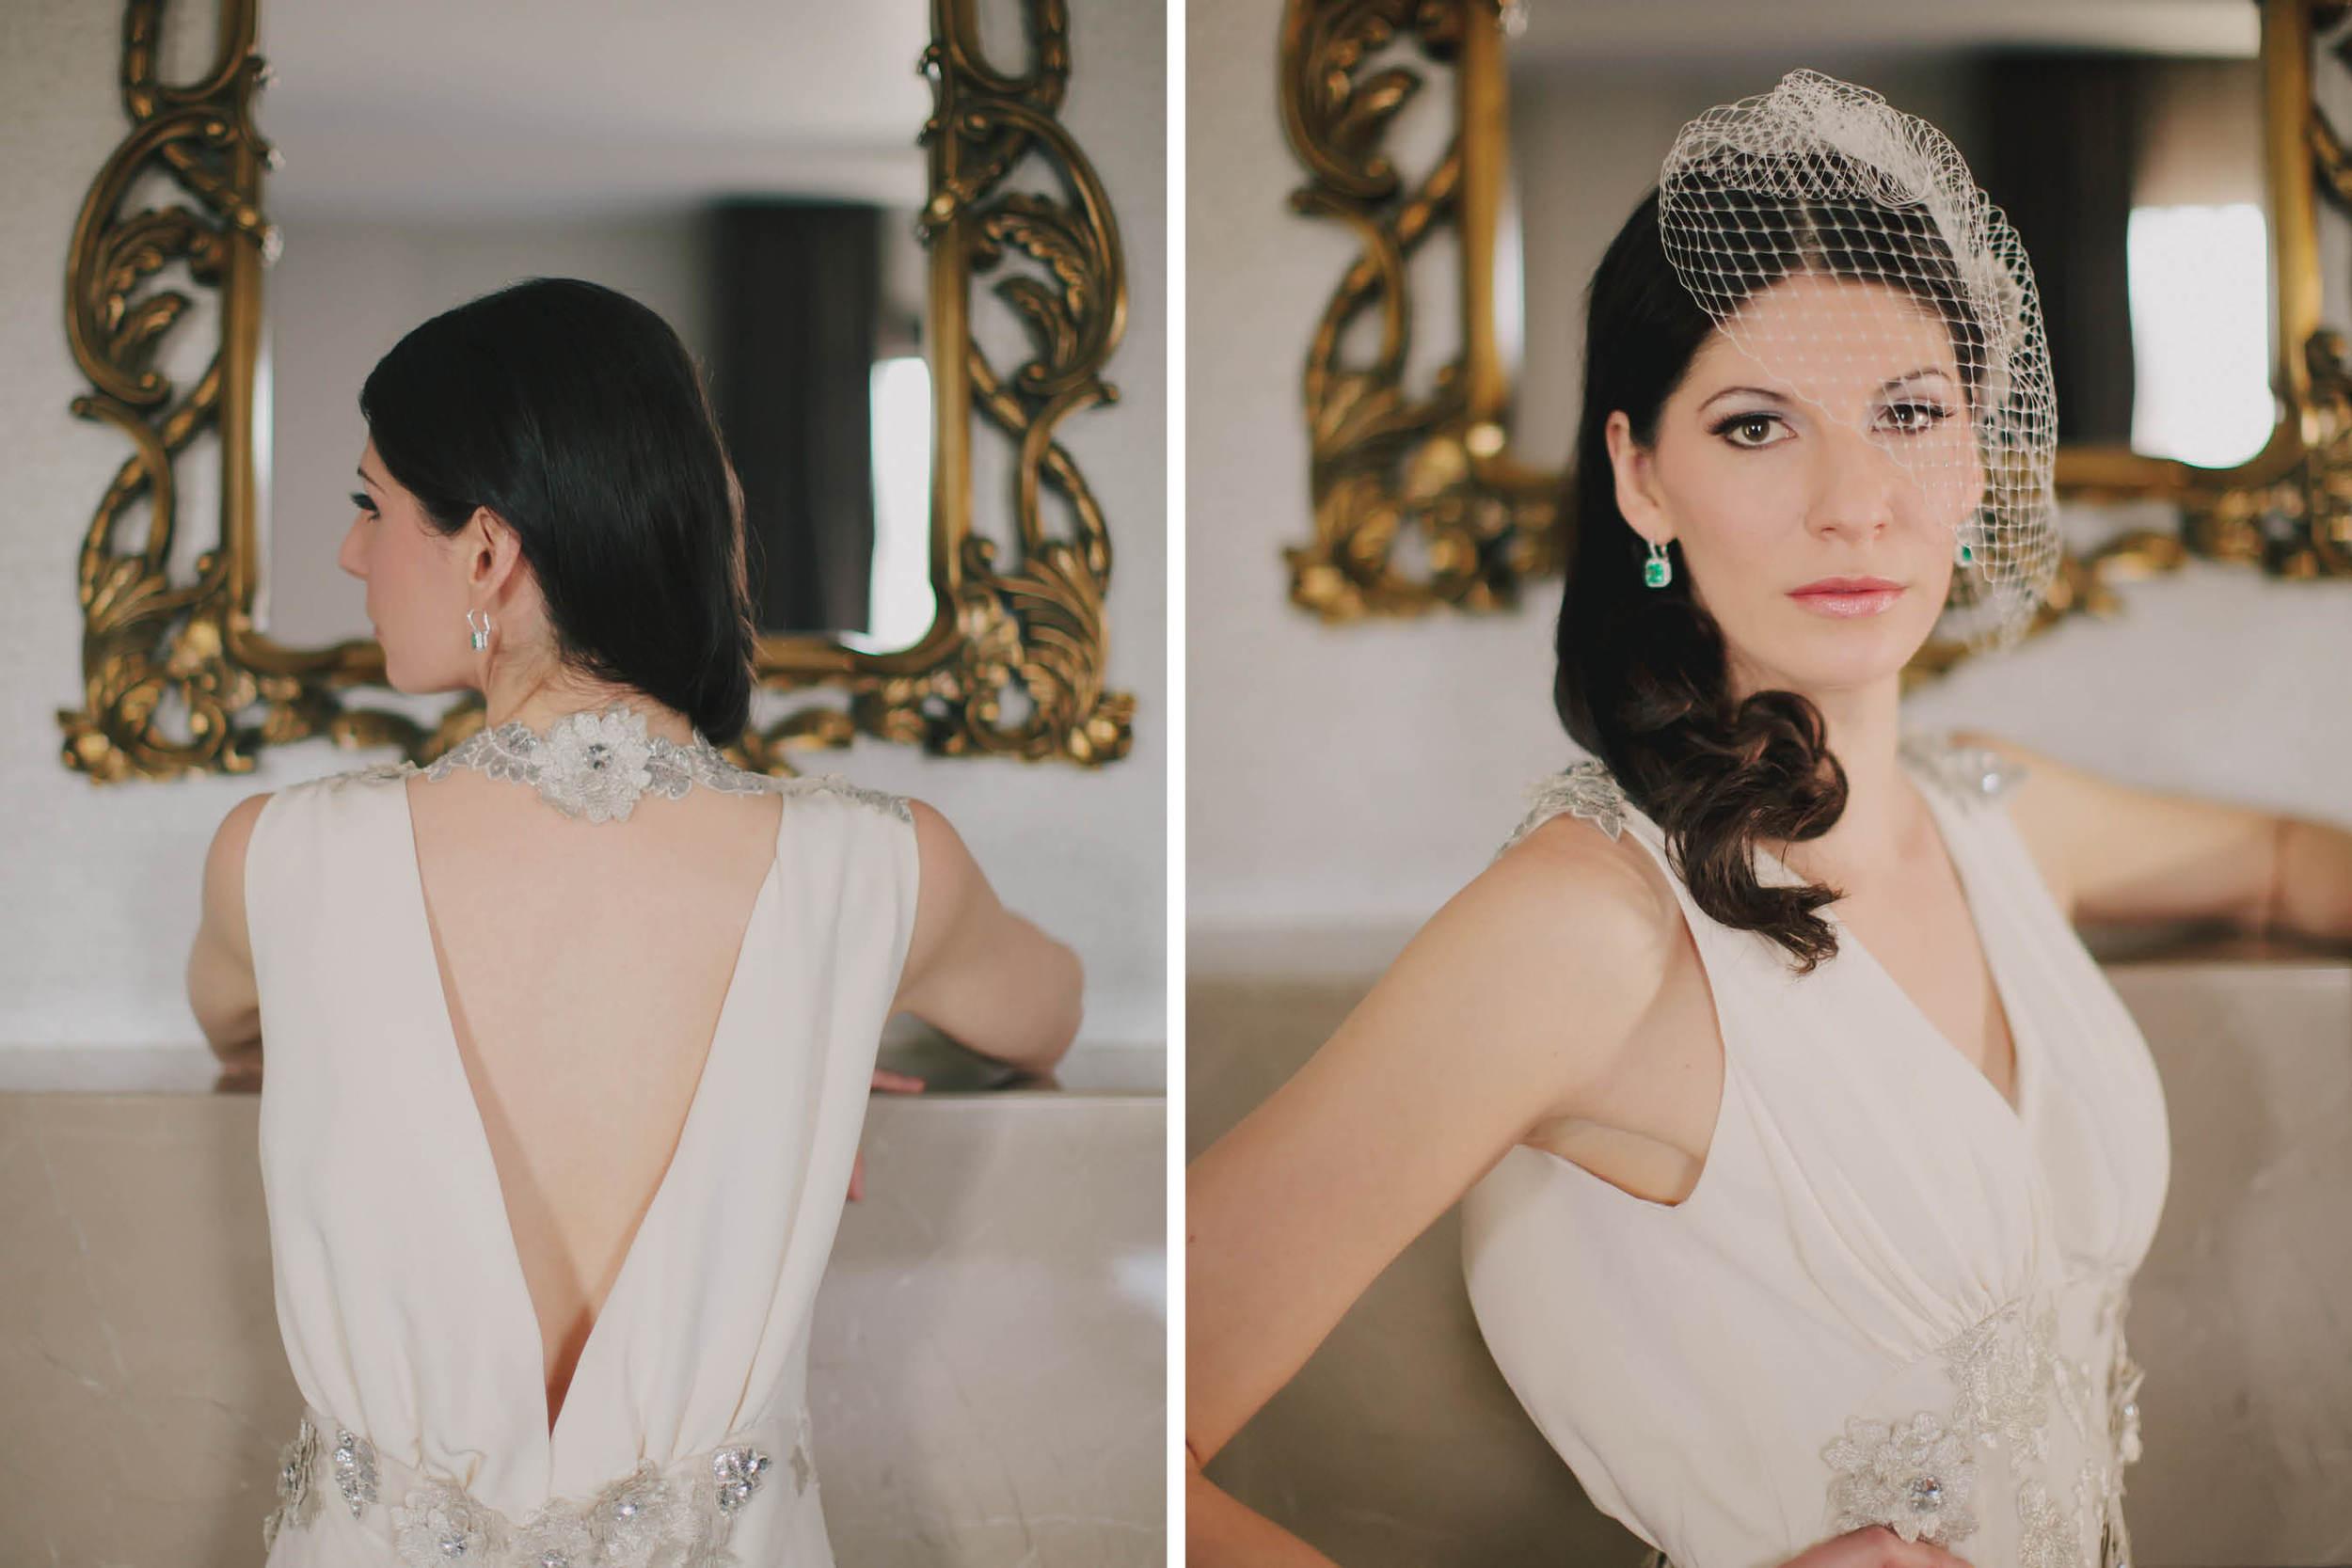 alegria-by-design-wedding-planner-coordinator-santa-barbara-montecito-inn-penthouse (11).jpg